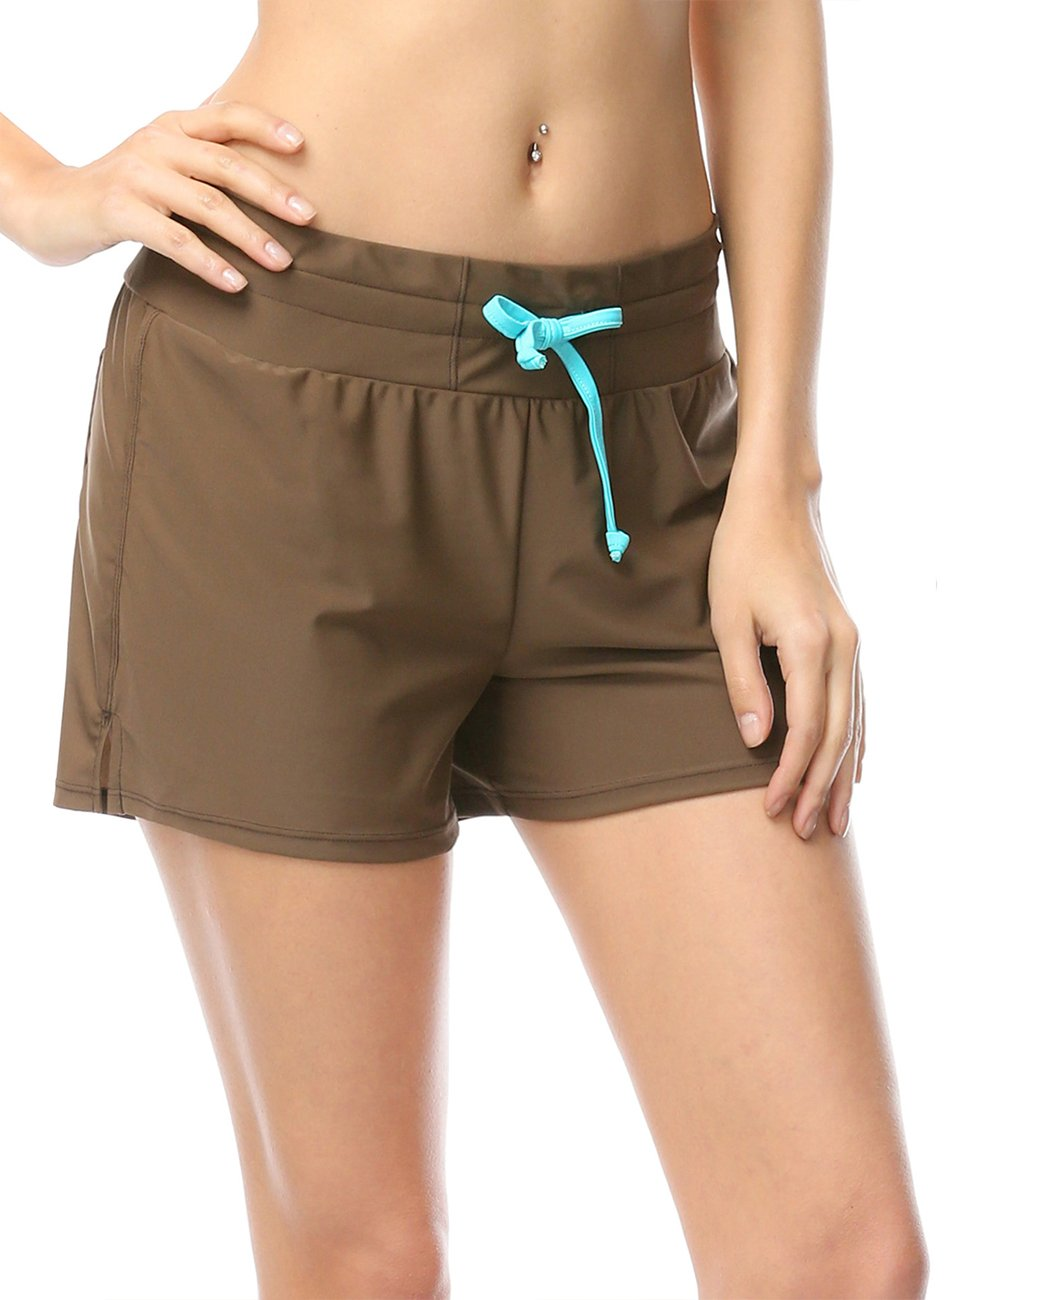 iDrawl Women Ladies Boy Leg Swimming Shorts Boy Style Adjustable Drawstring Swim Trunk Swimsuit XS to 2XL